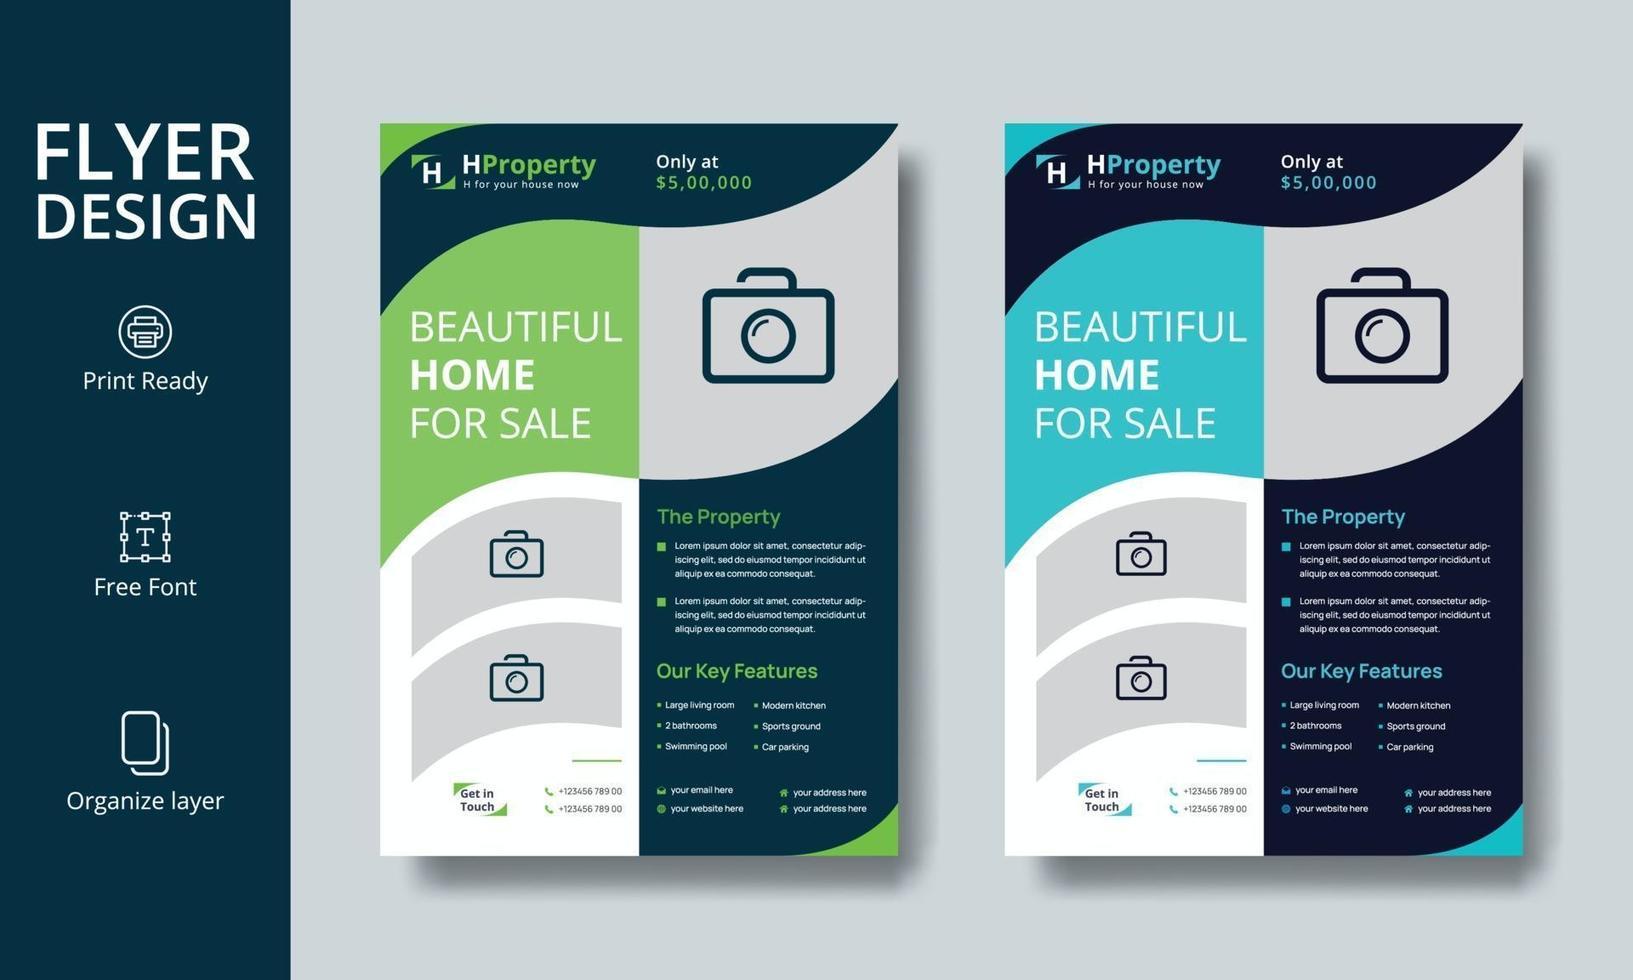 kreative professionelle Immobilien Flyer oder Broschüre Design vektor